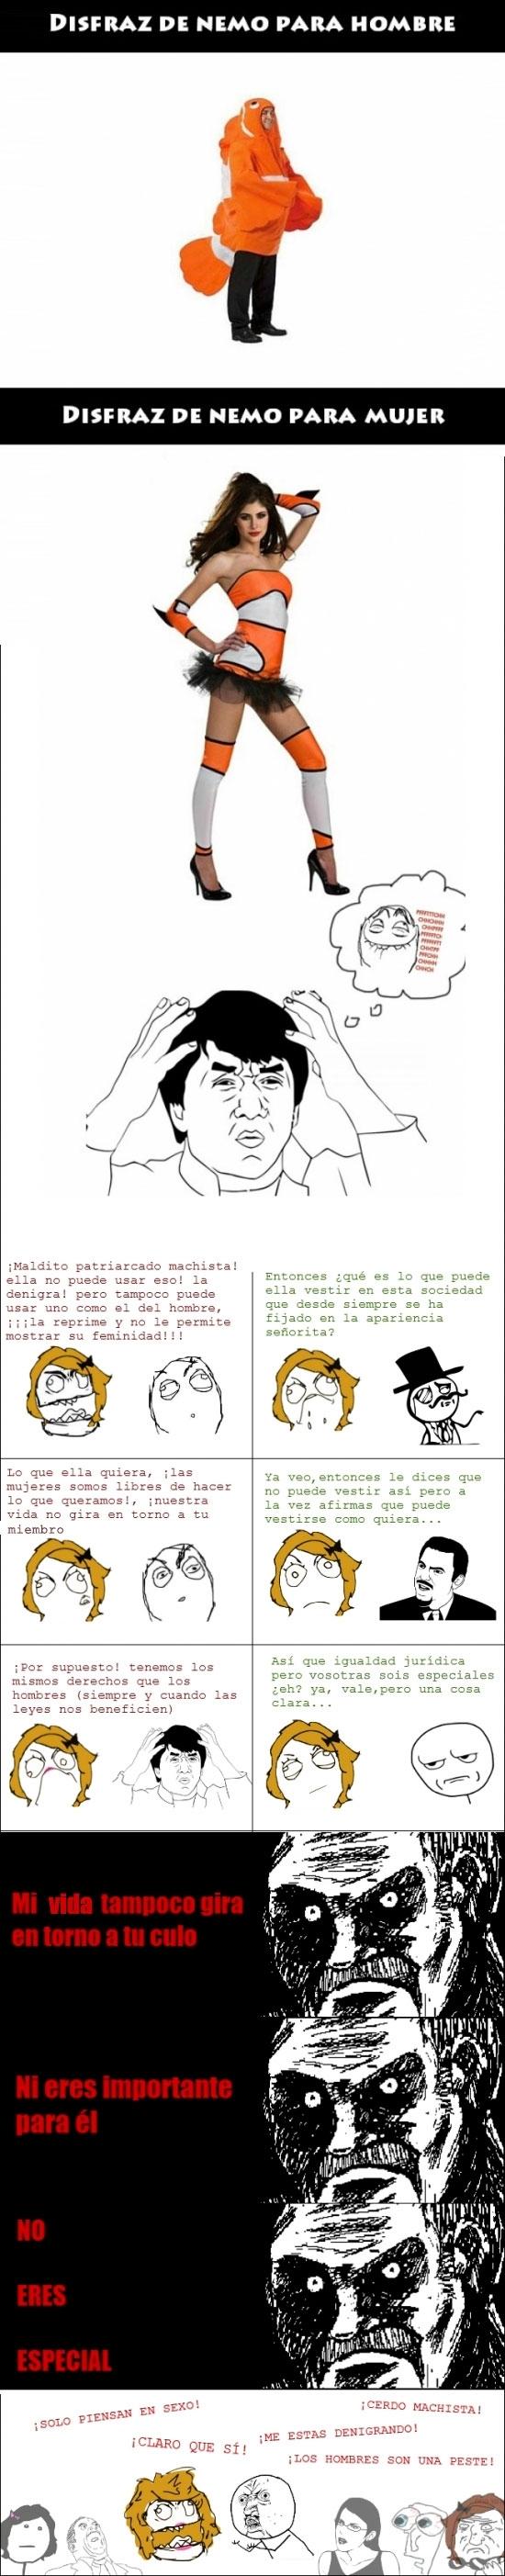 disfraz,Feminazis,machismo,true story